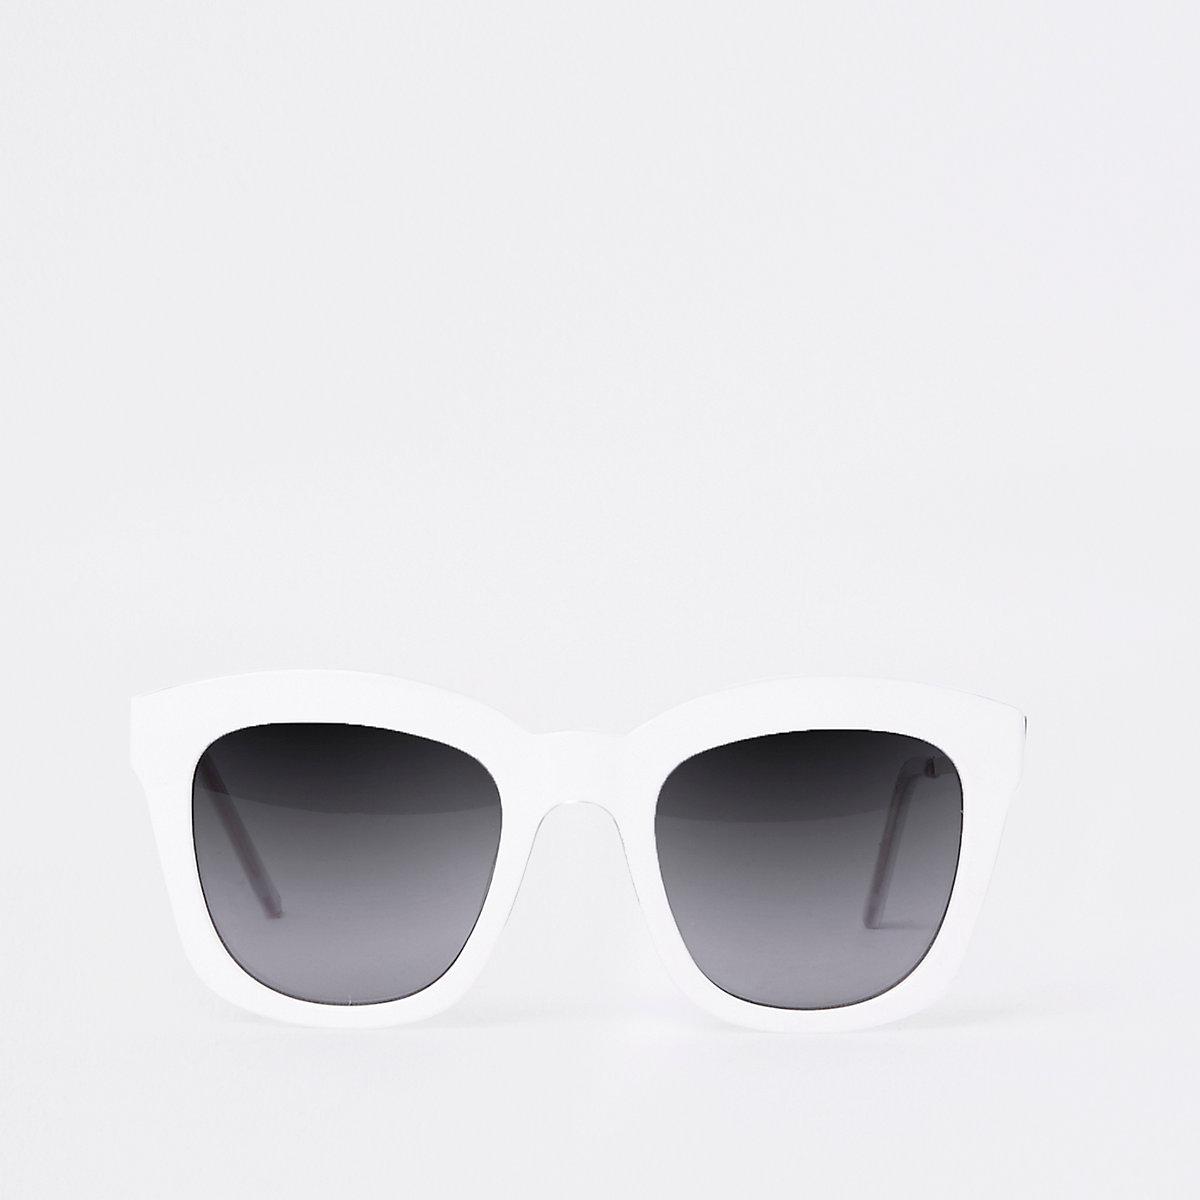 White oversized glam sunglasses